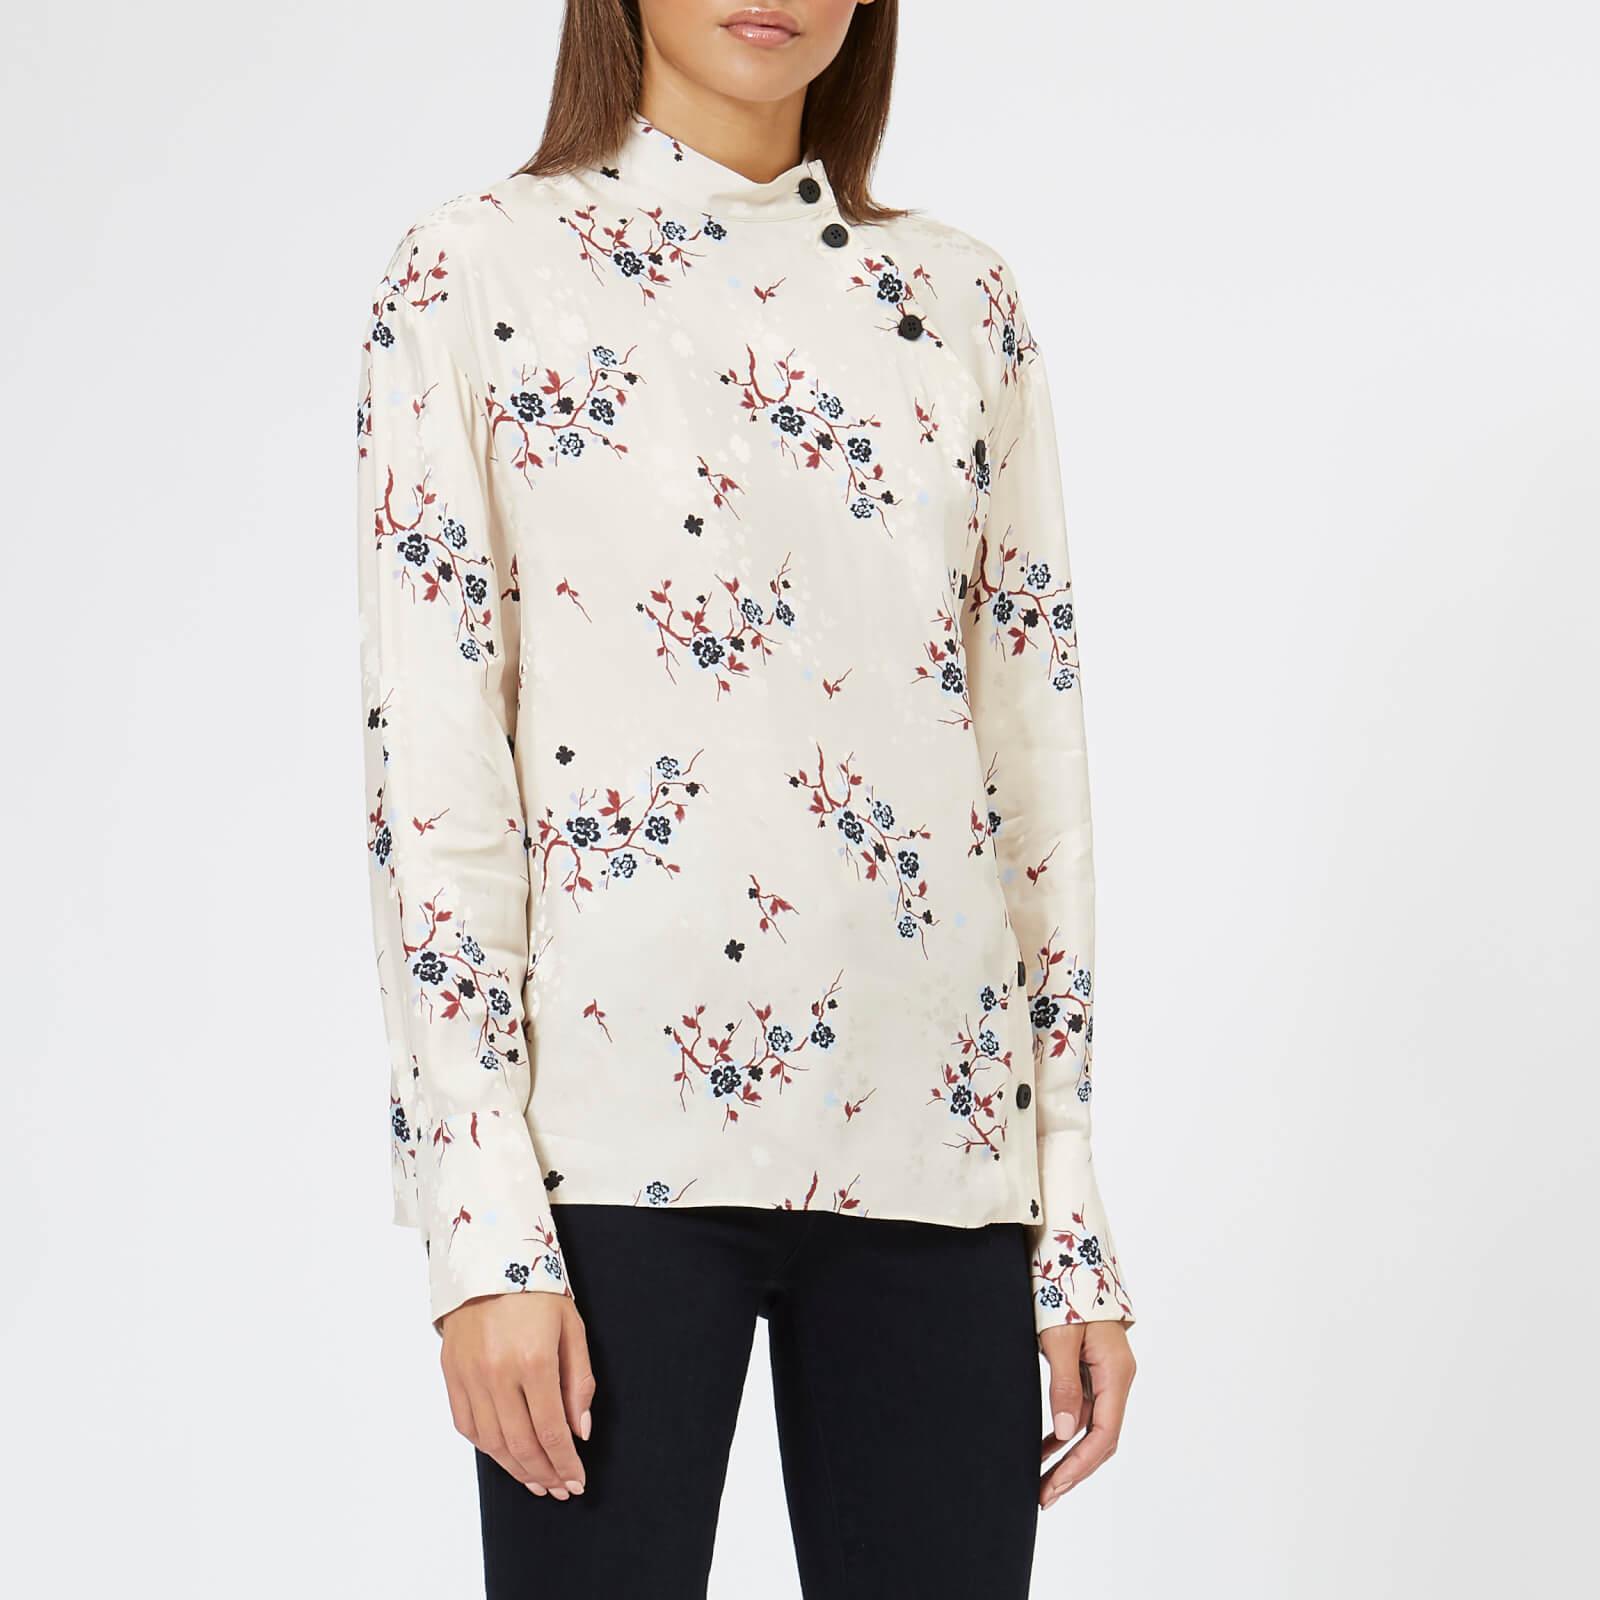 e496e28e1 KENZO Women's Cheongsam Flower Shirt - Sand - Free UK Delivery over £50